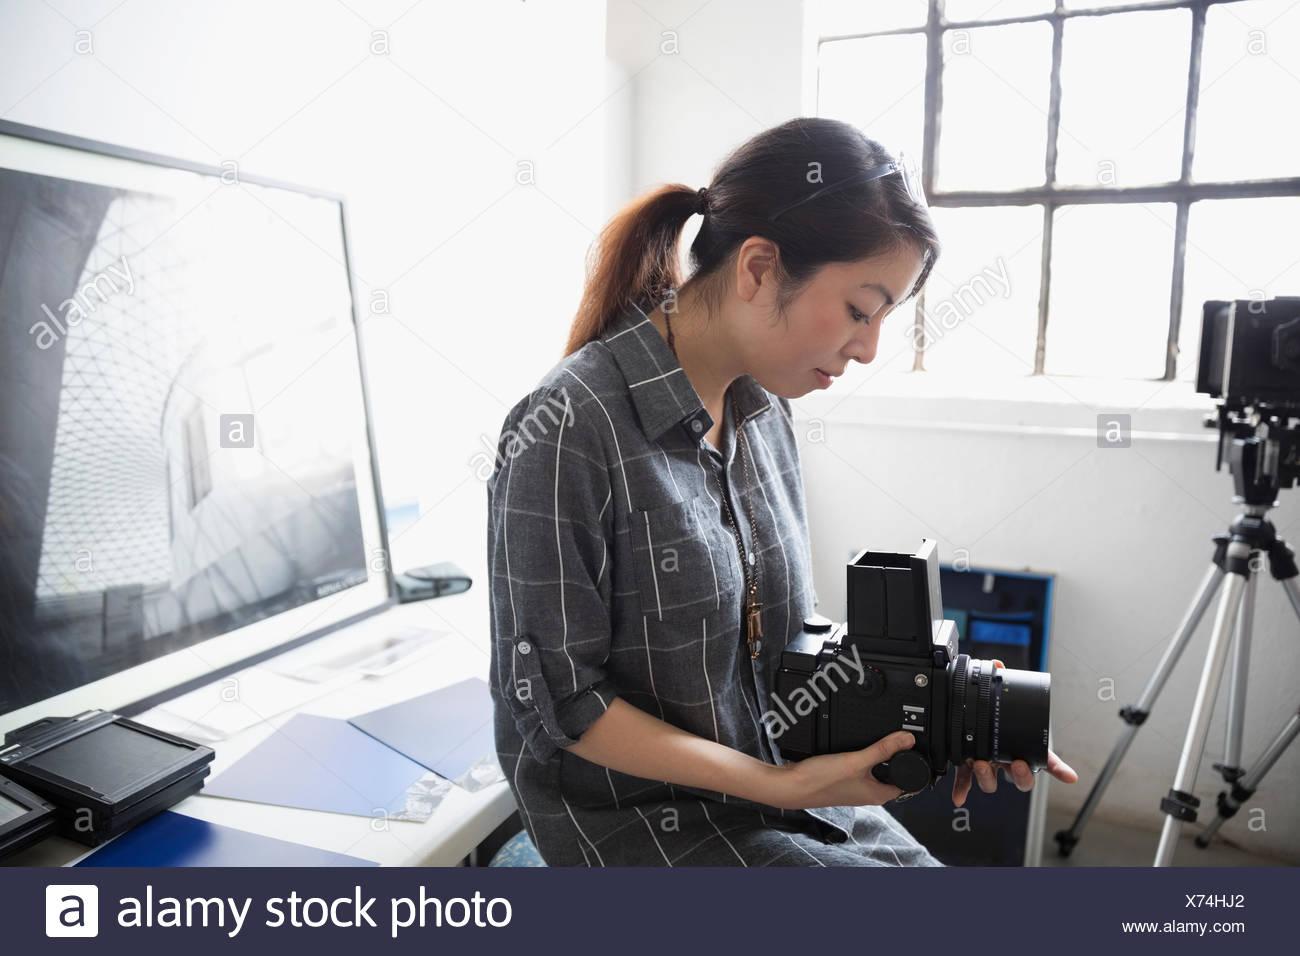 Female photographer adjusting digital camera lens in art studio - Stock Image